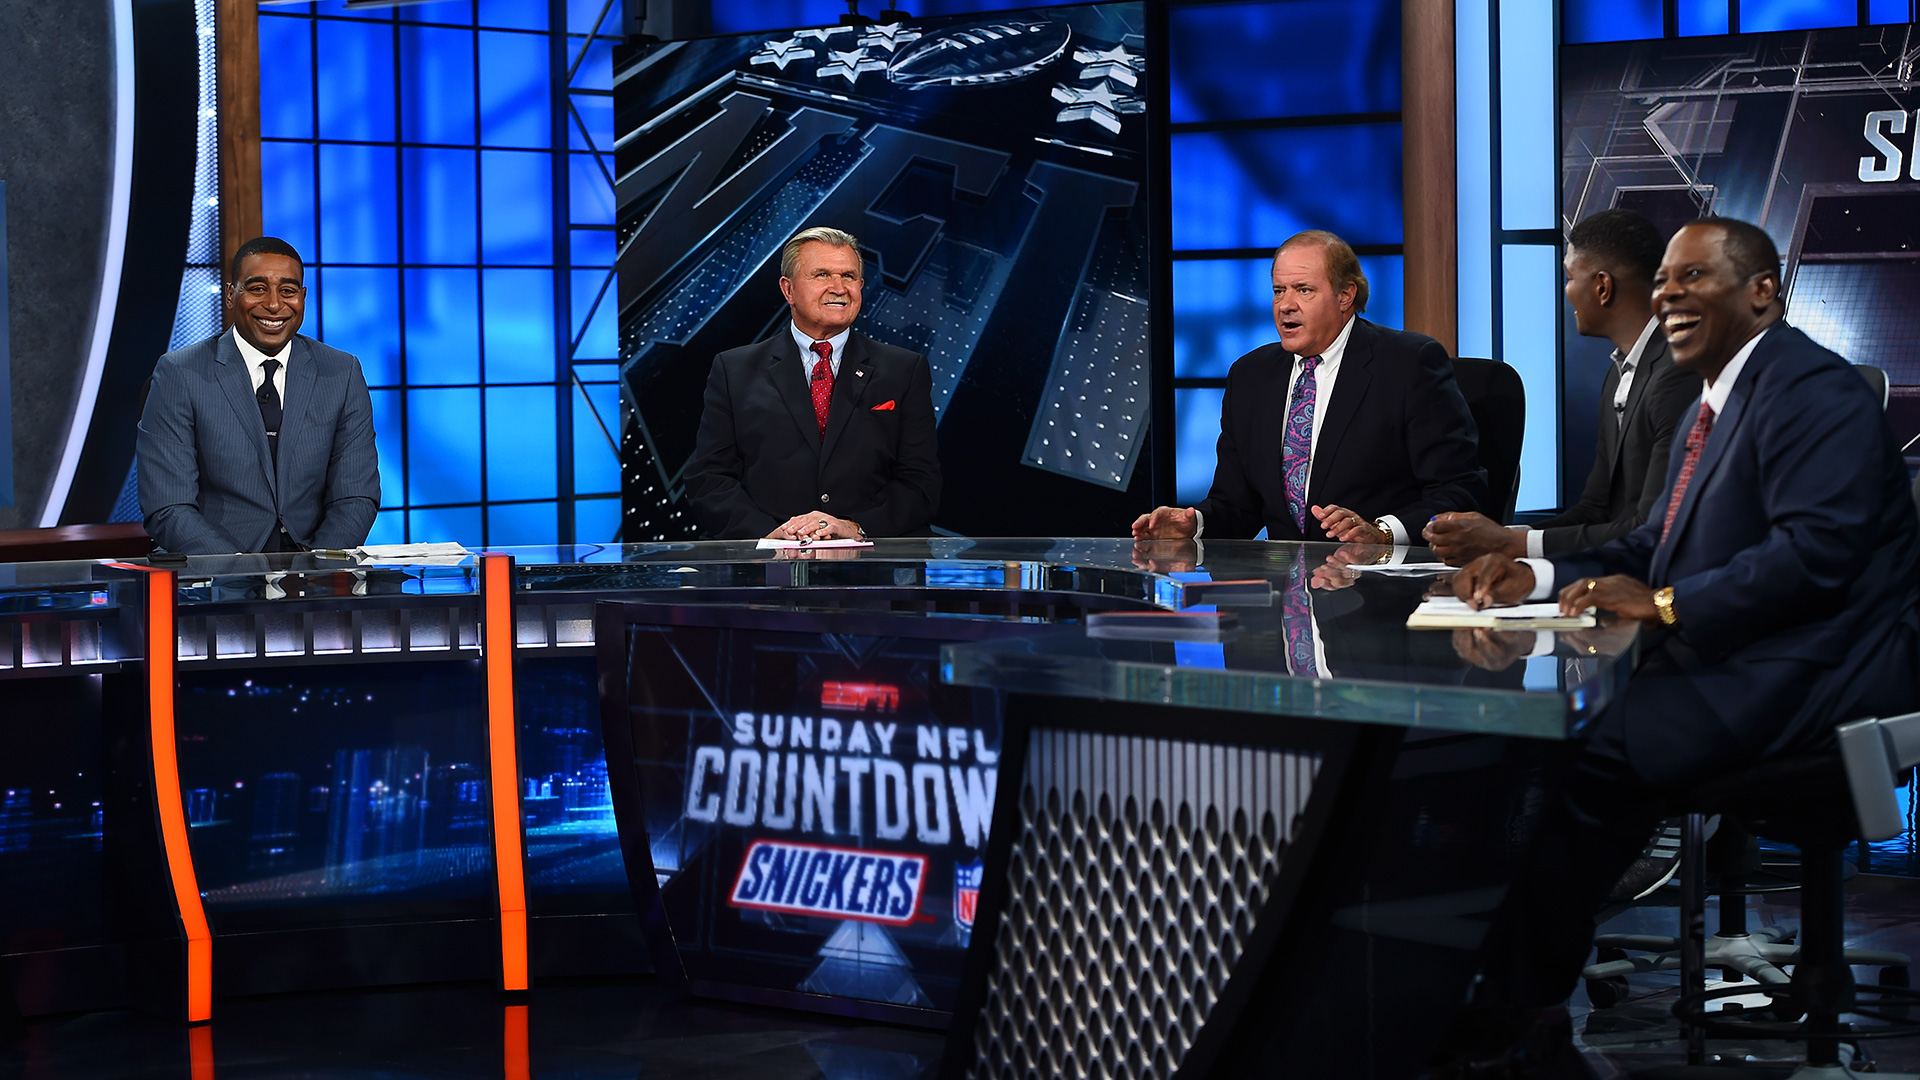 NFL-ANNOUNCERS-Sunday-NFL-Countdown-011416-ESPN-FTR.jpg